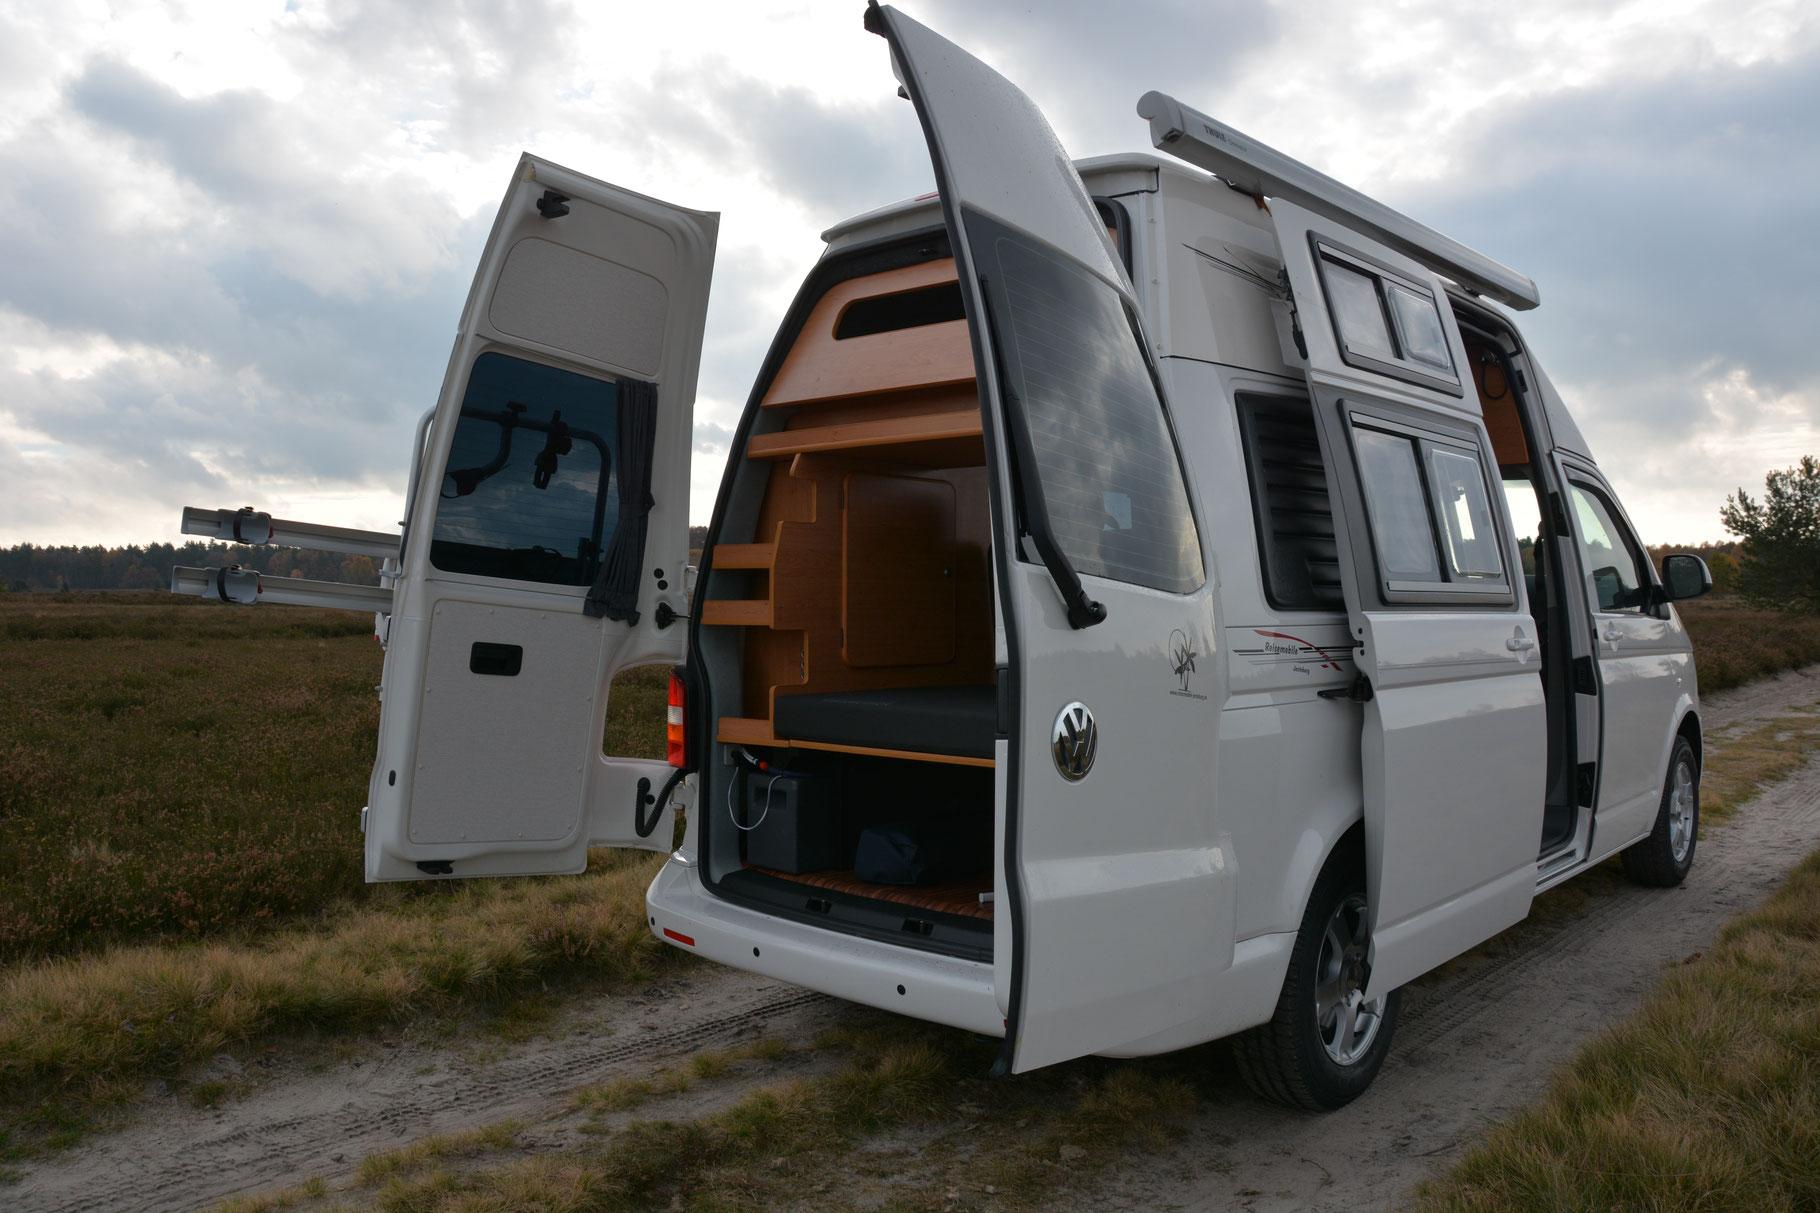 wohnmobil vw t5 hochdach volkswagen car. Black Bedroom Furniture Sets. Home Design Ideas